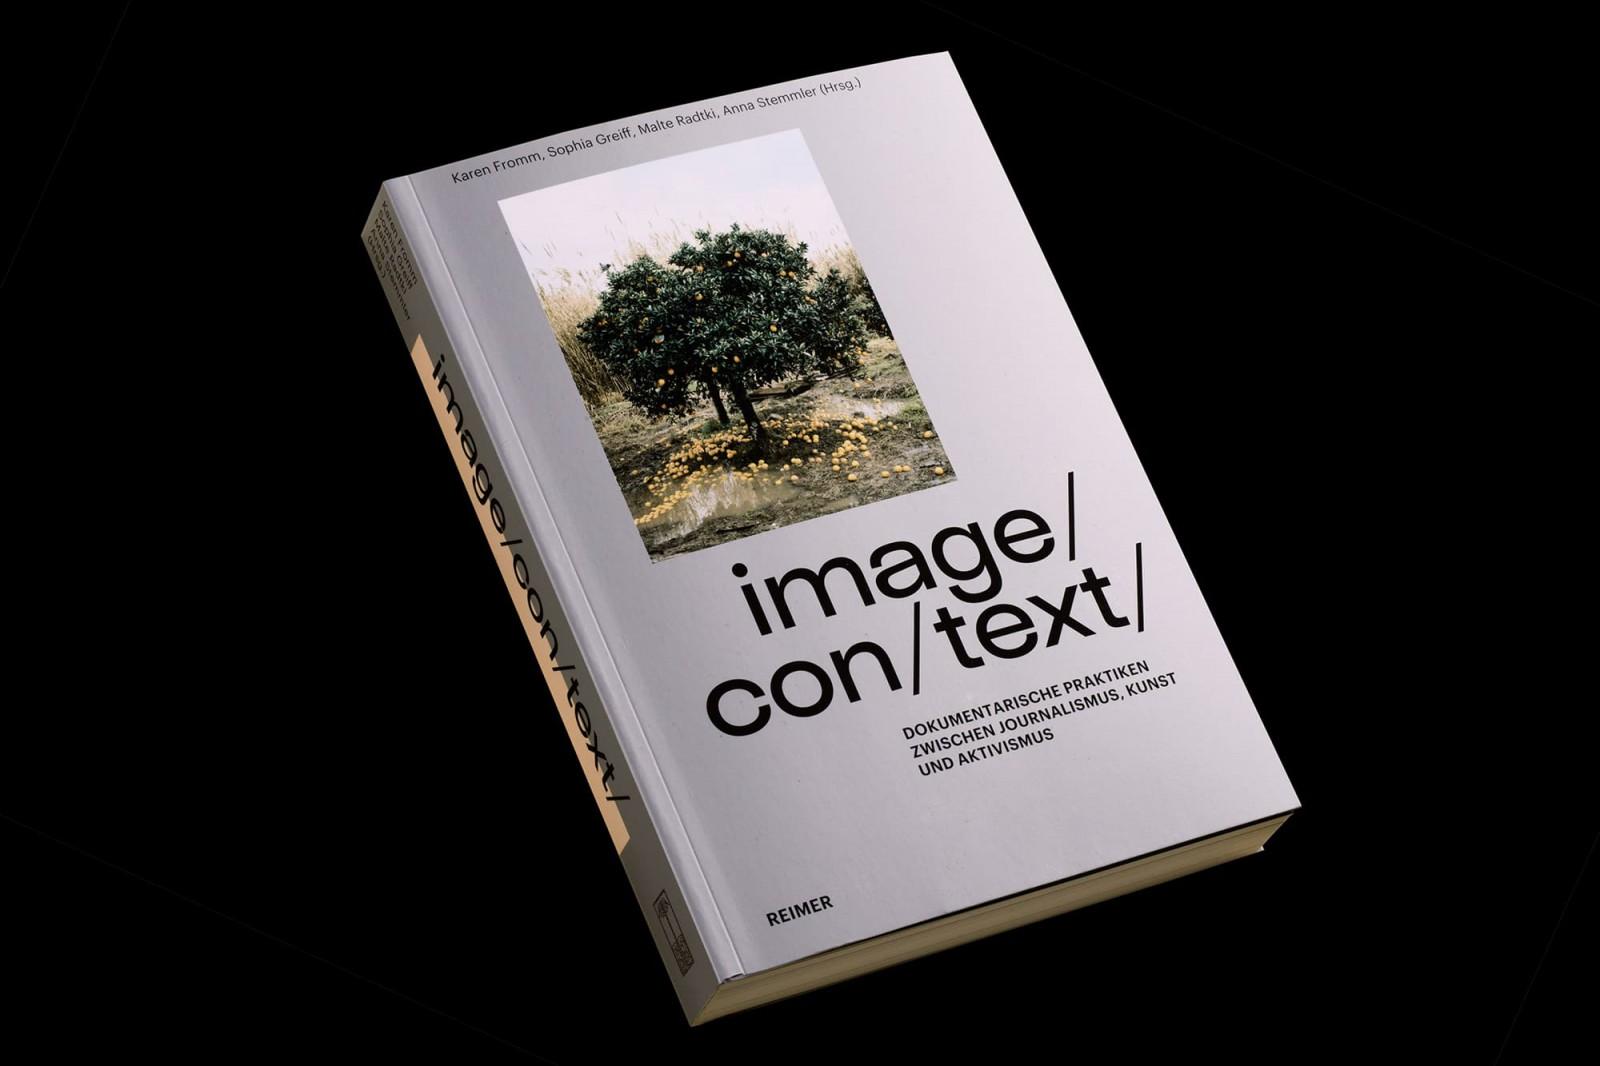 image/ con/ text